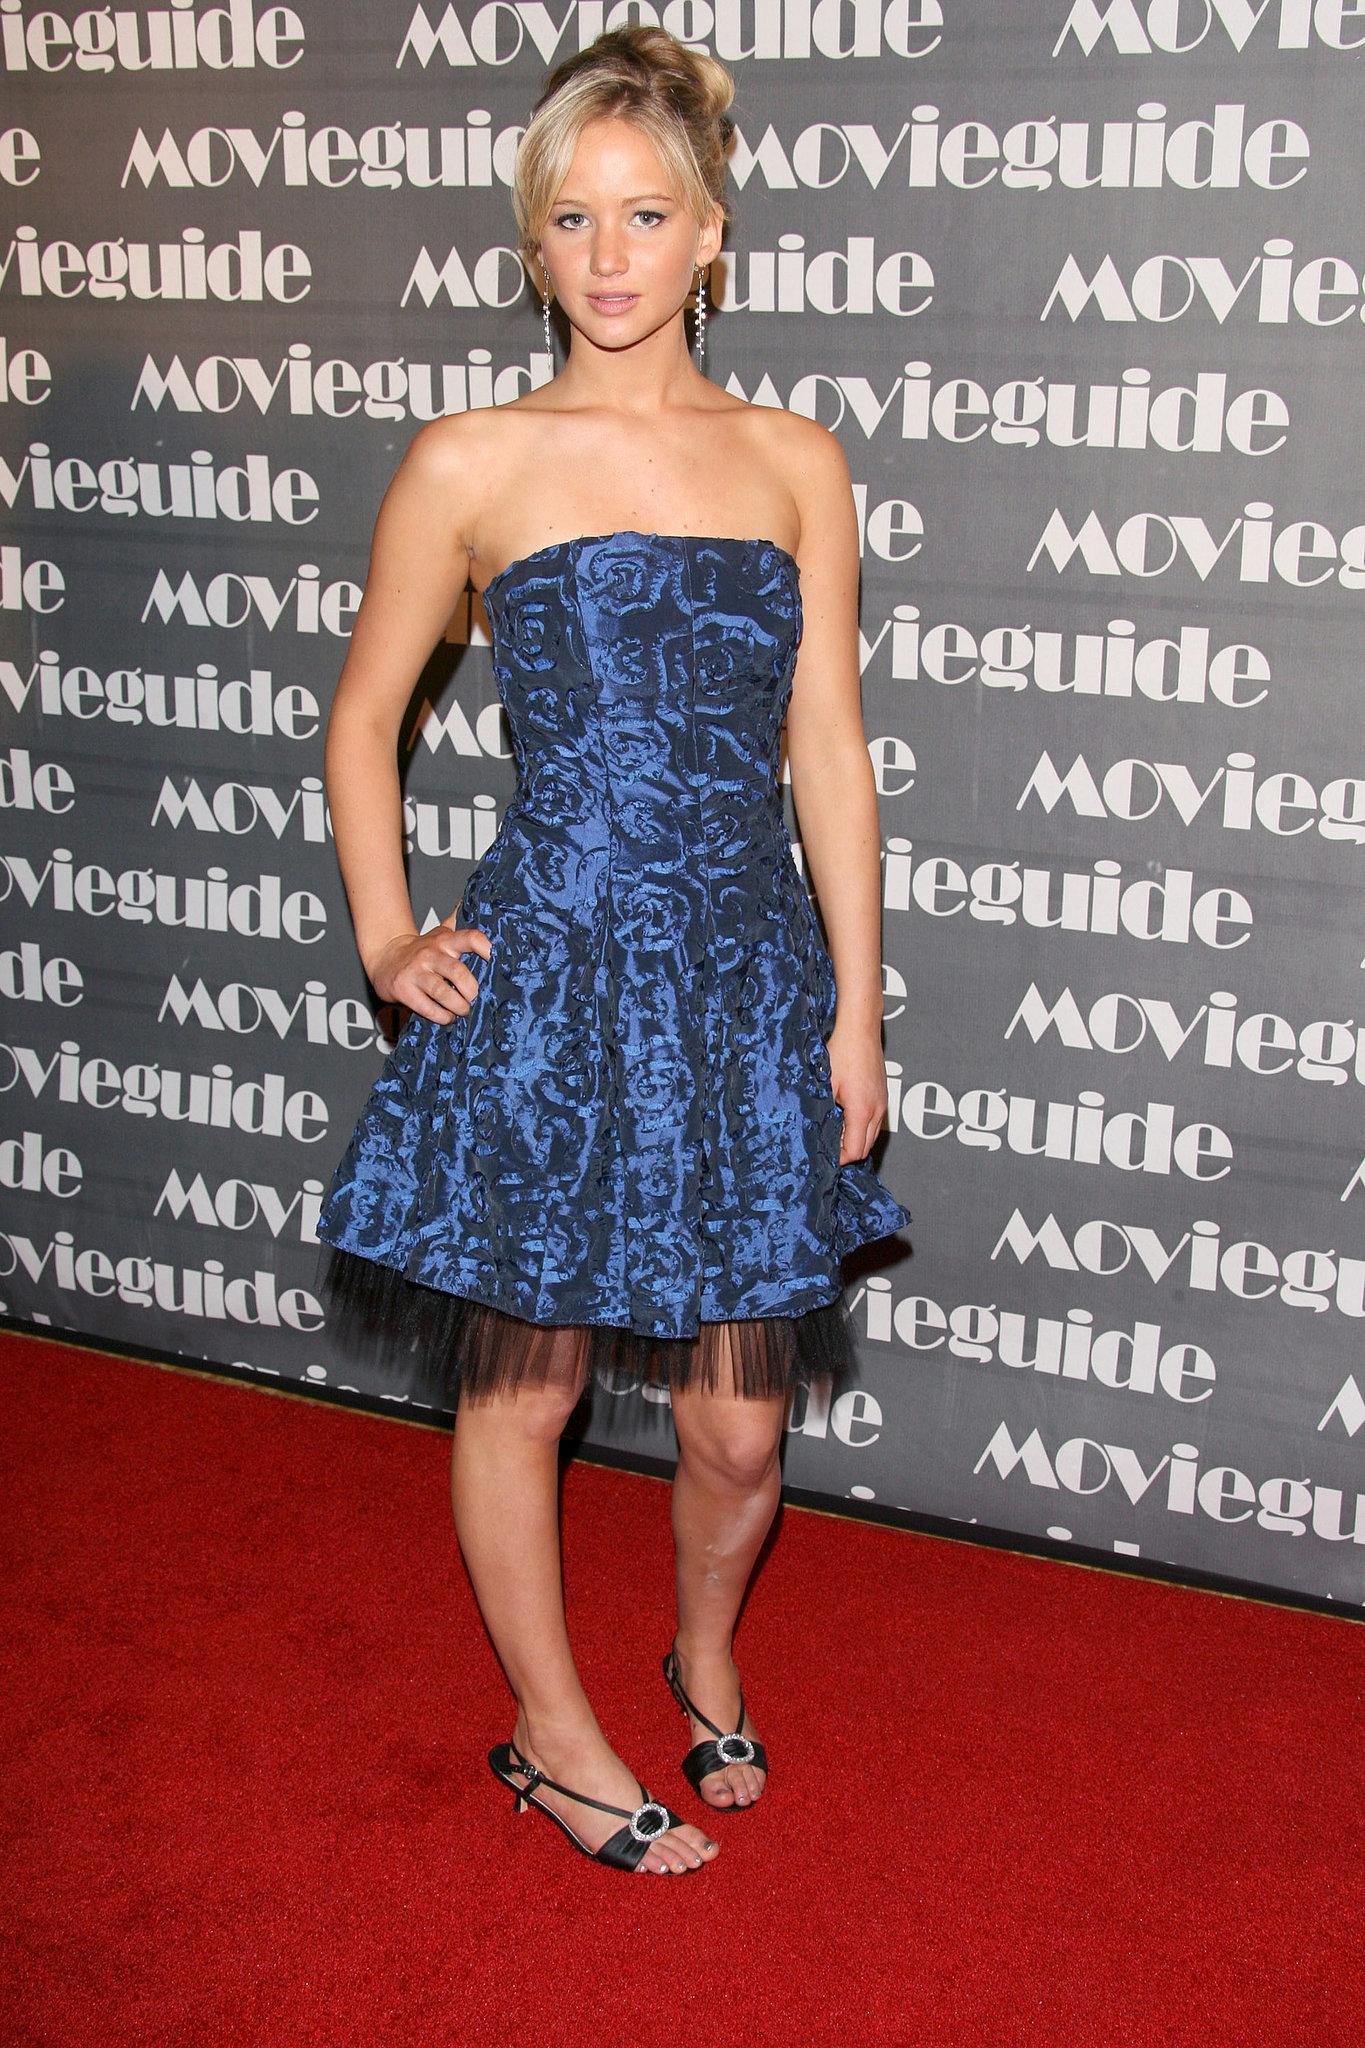 Jennifer Lawrence, 2007